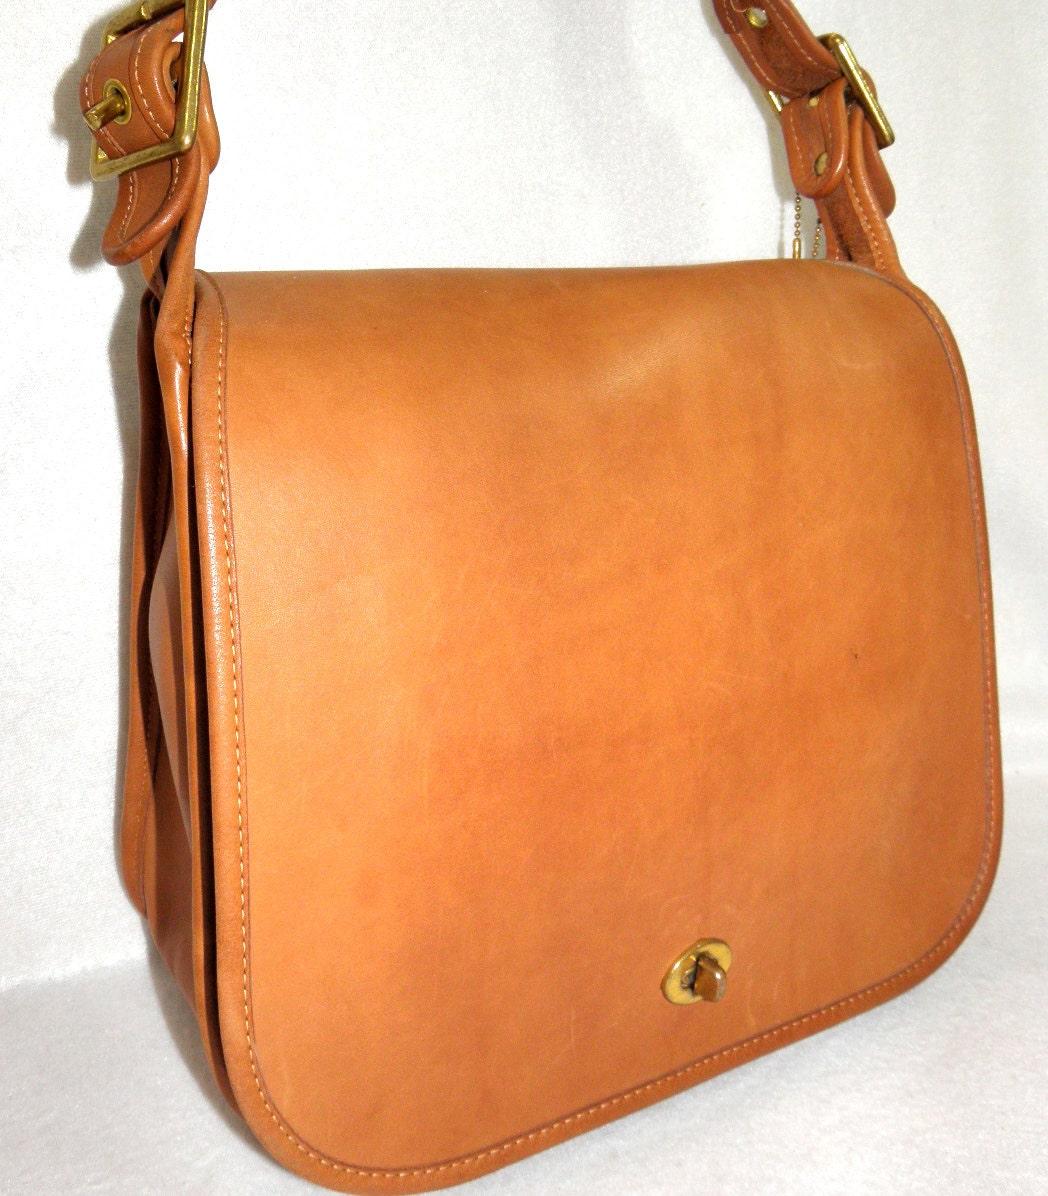 Large British Tan Leather Saddle Bag Vintage By